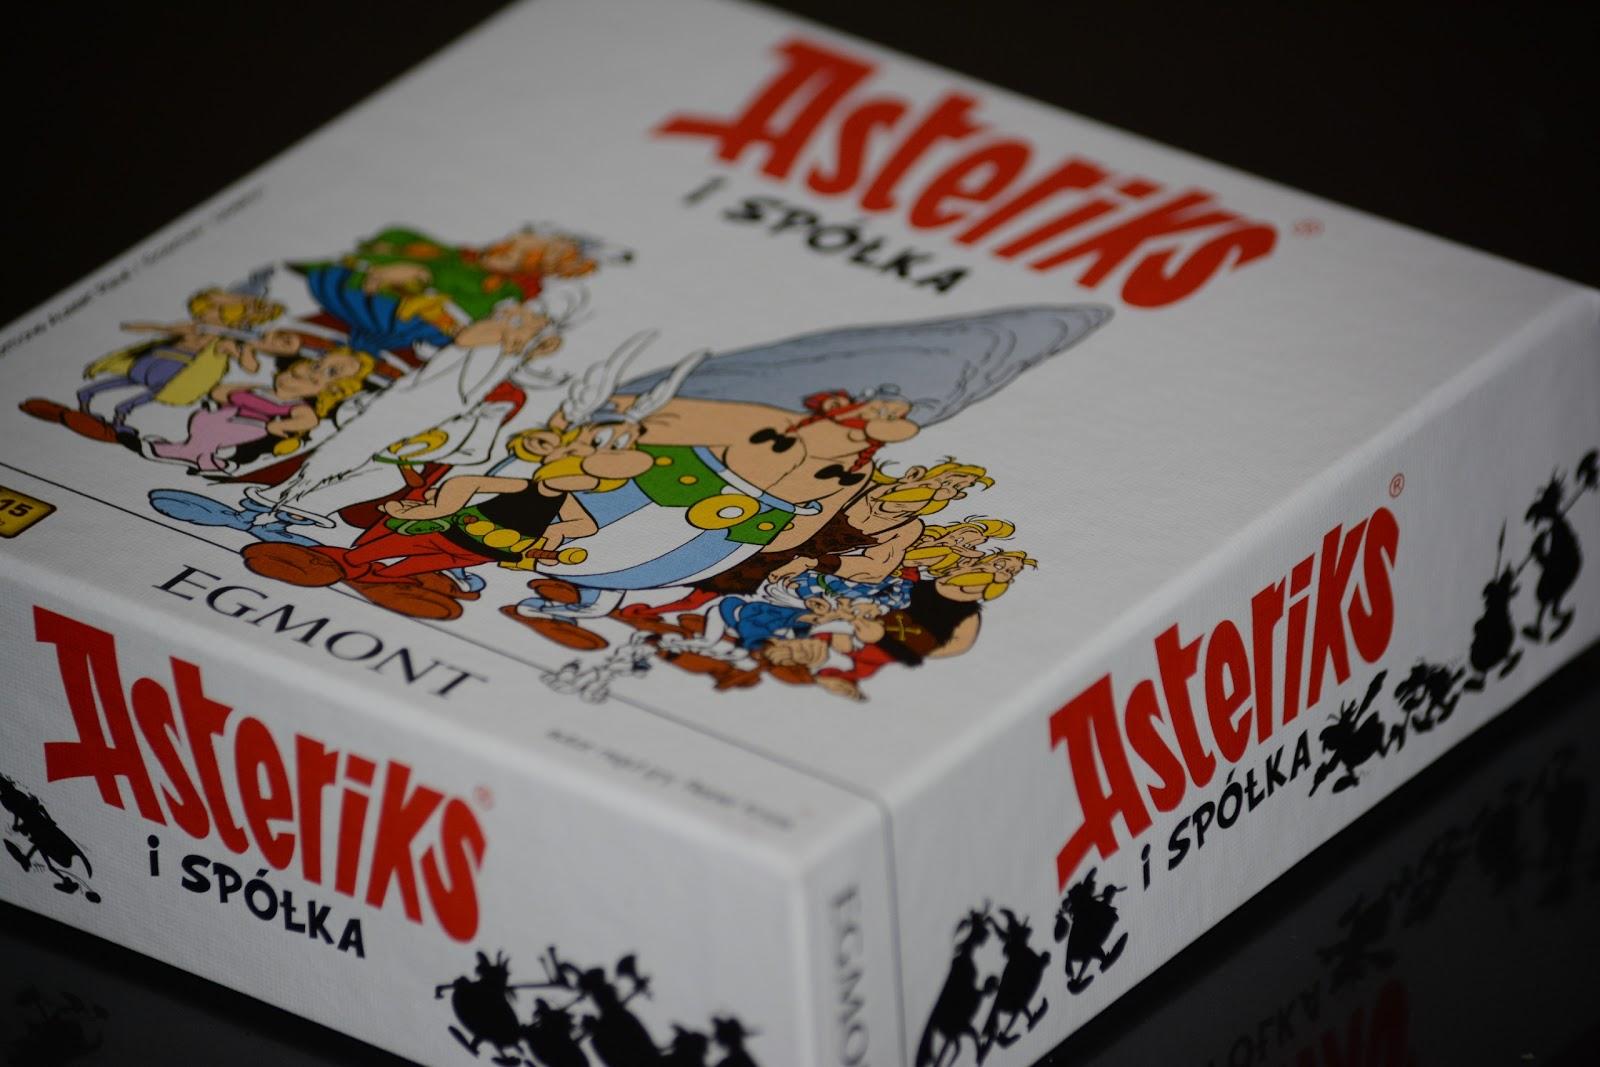 http://slowaduzeimale.blogspot.com/2014/11/pamiec-o-asterixie-asterix-i-spoka.html